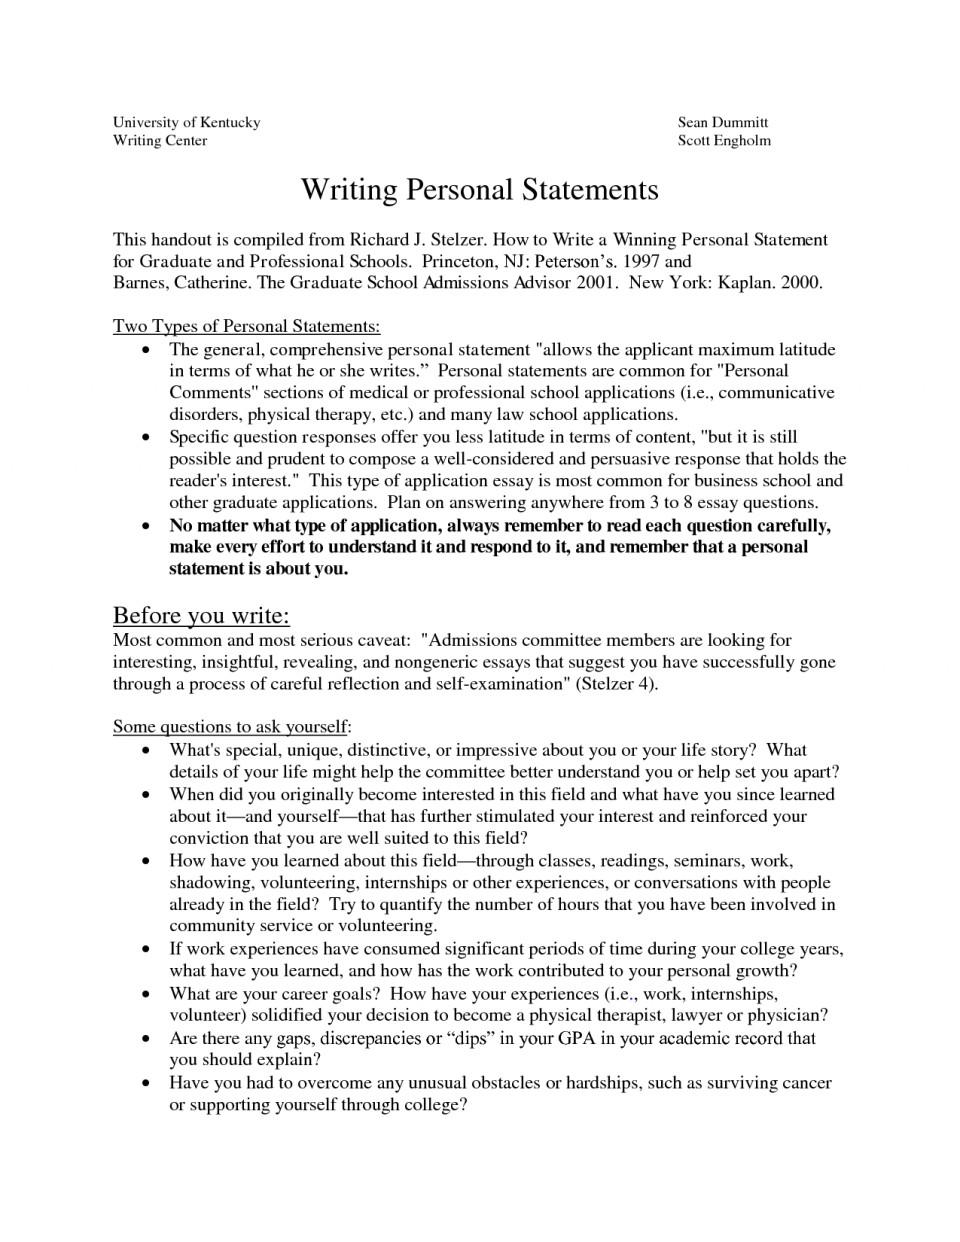 004 Essay Example Free Sample For Graduate School Formidable Admission Pdf 960